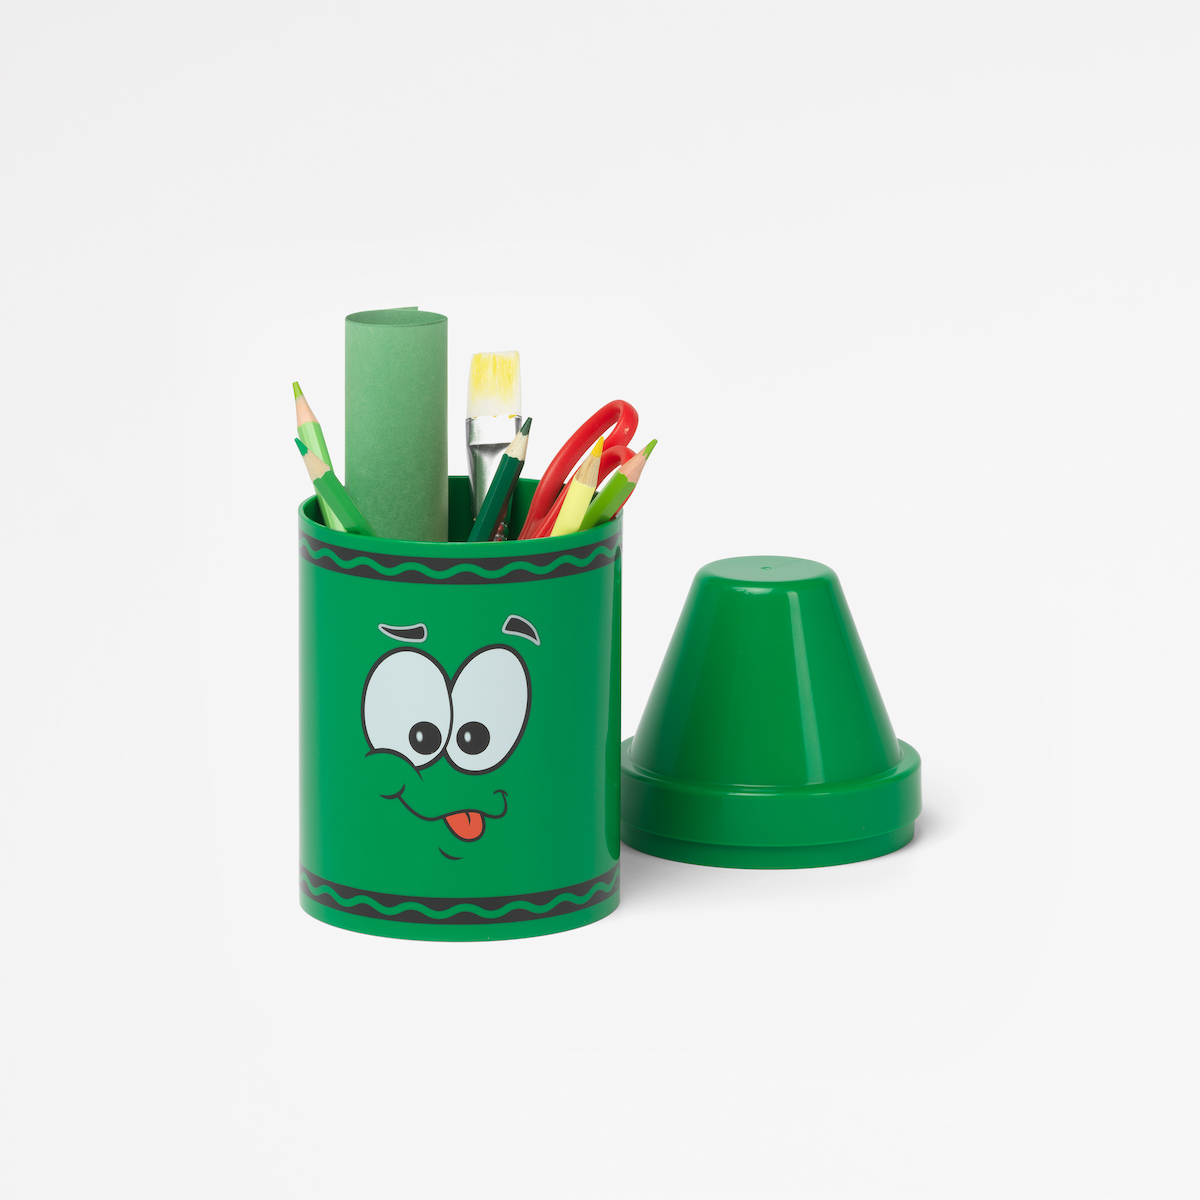 Crayola® Tip™ Storage Small